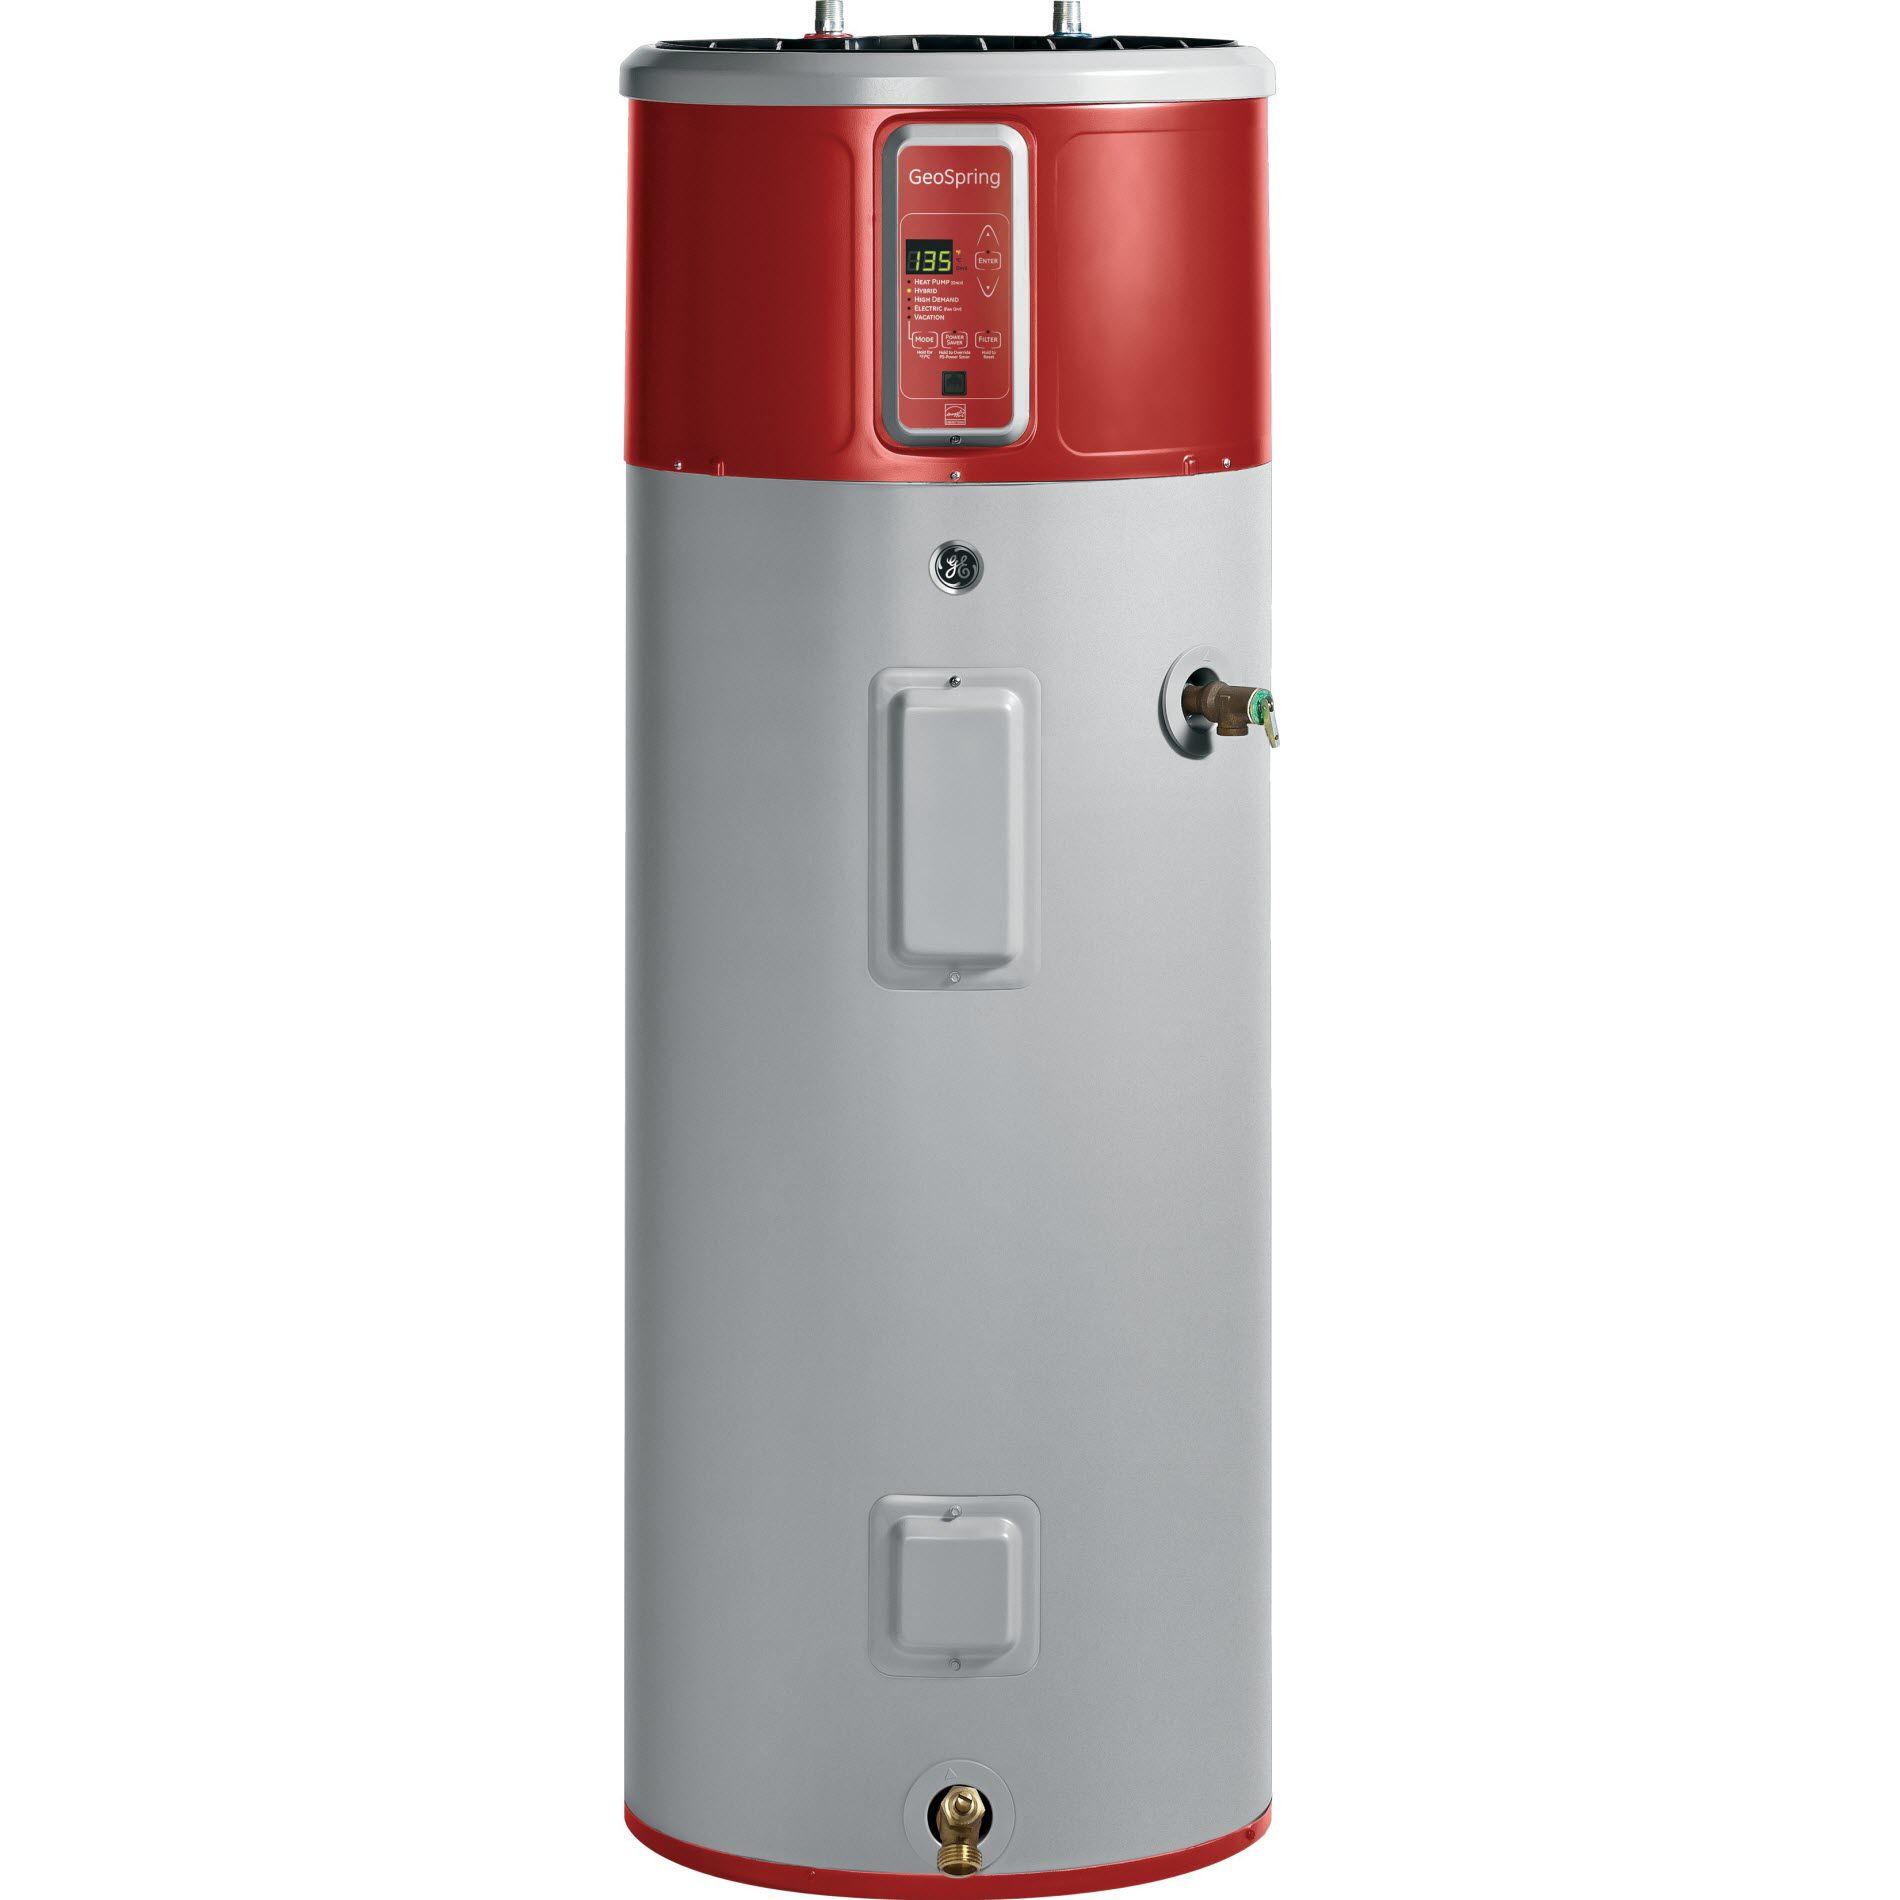 GE Appliances GeoSpring 50 Gal. 10-Year Hybrid-Electric Heat Pump Water Heater